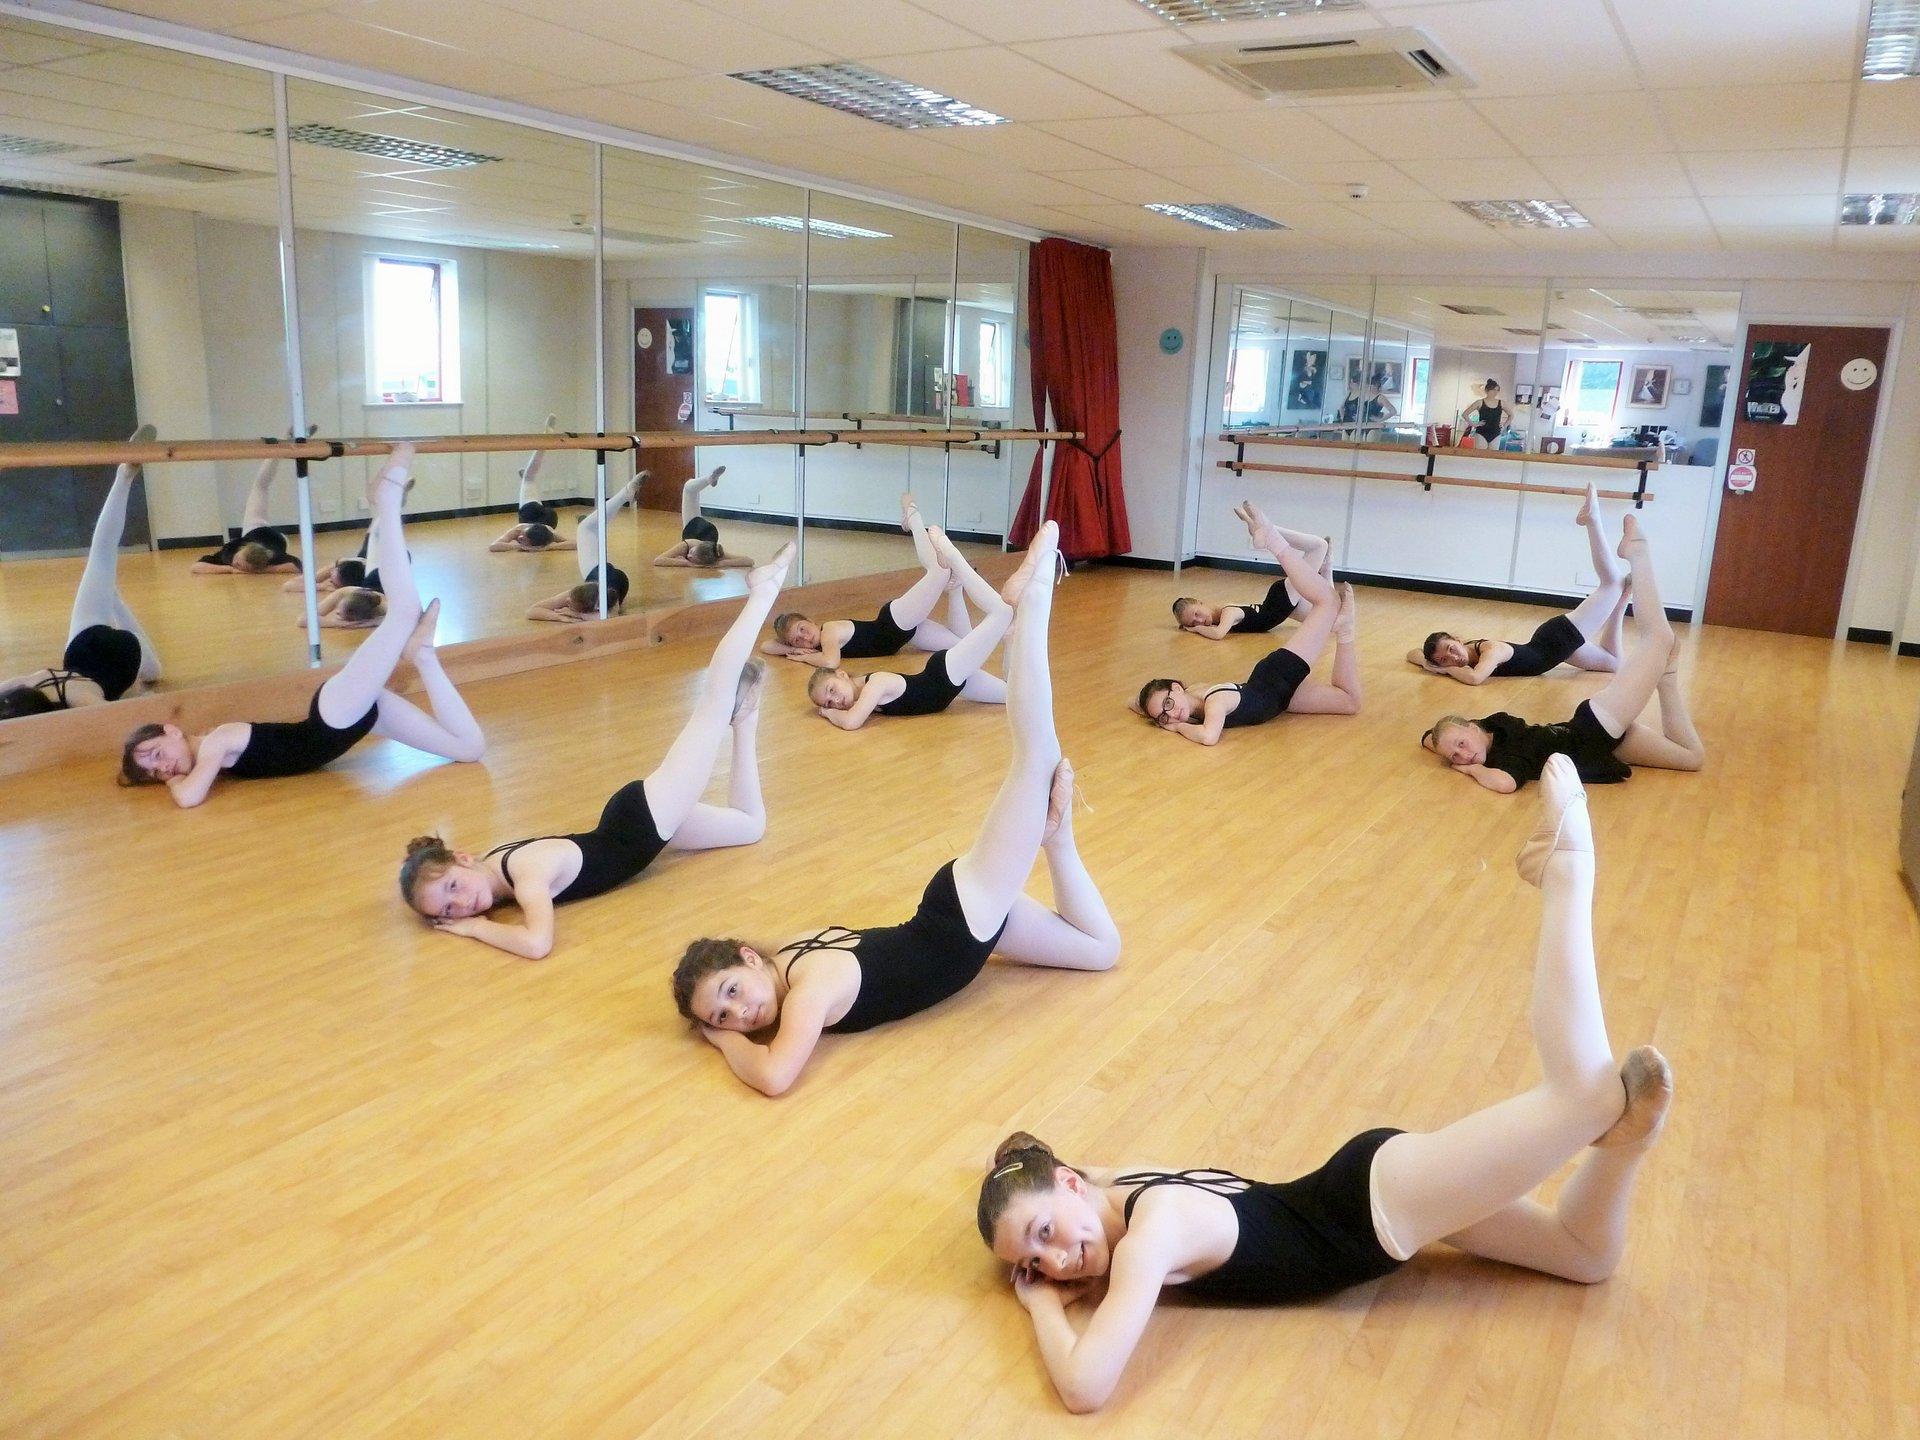 dancers practicing